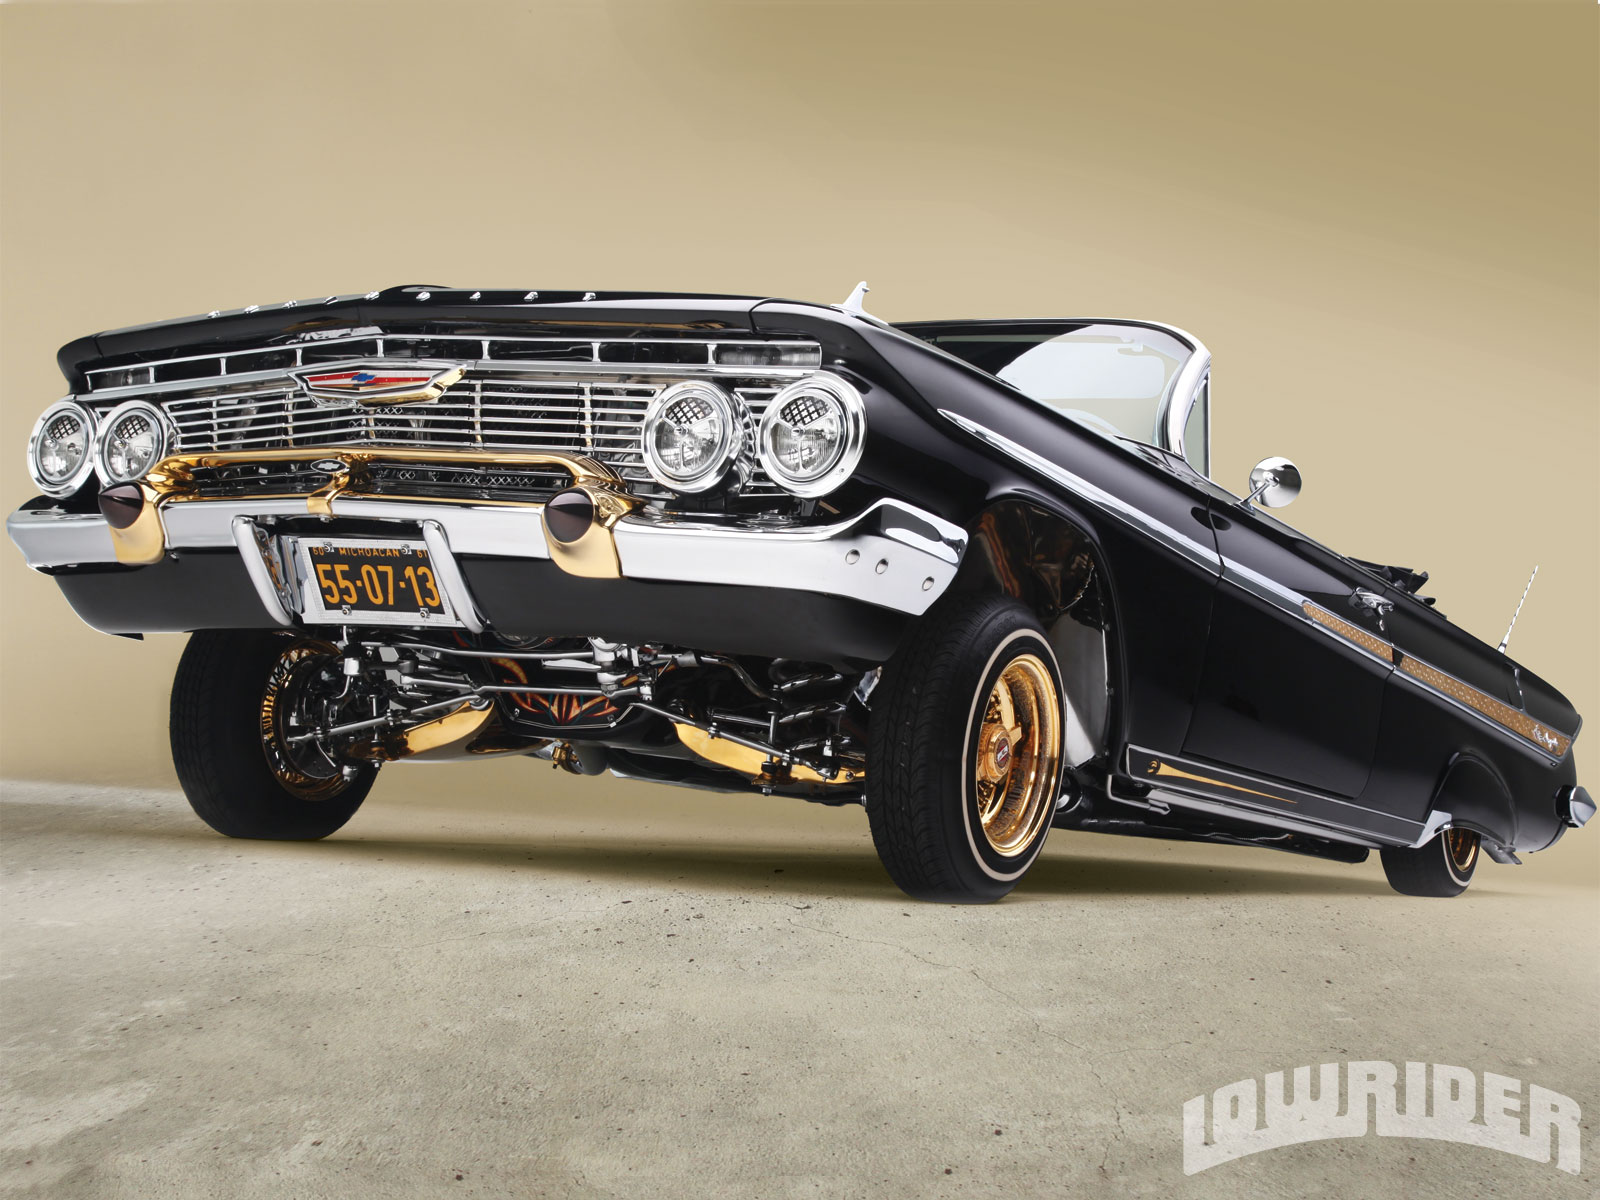 64 Impala Convertible >> 1961 Chevrolet Impala Convertible - Lowrider Magazine